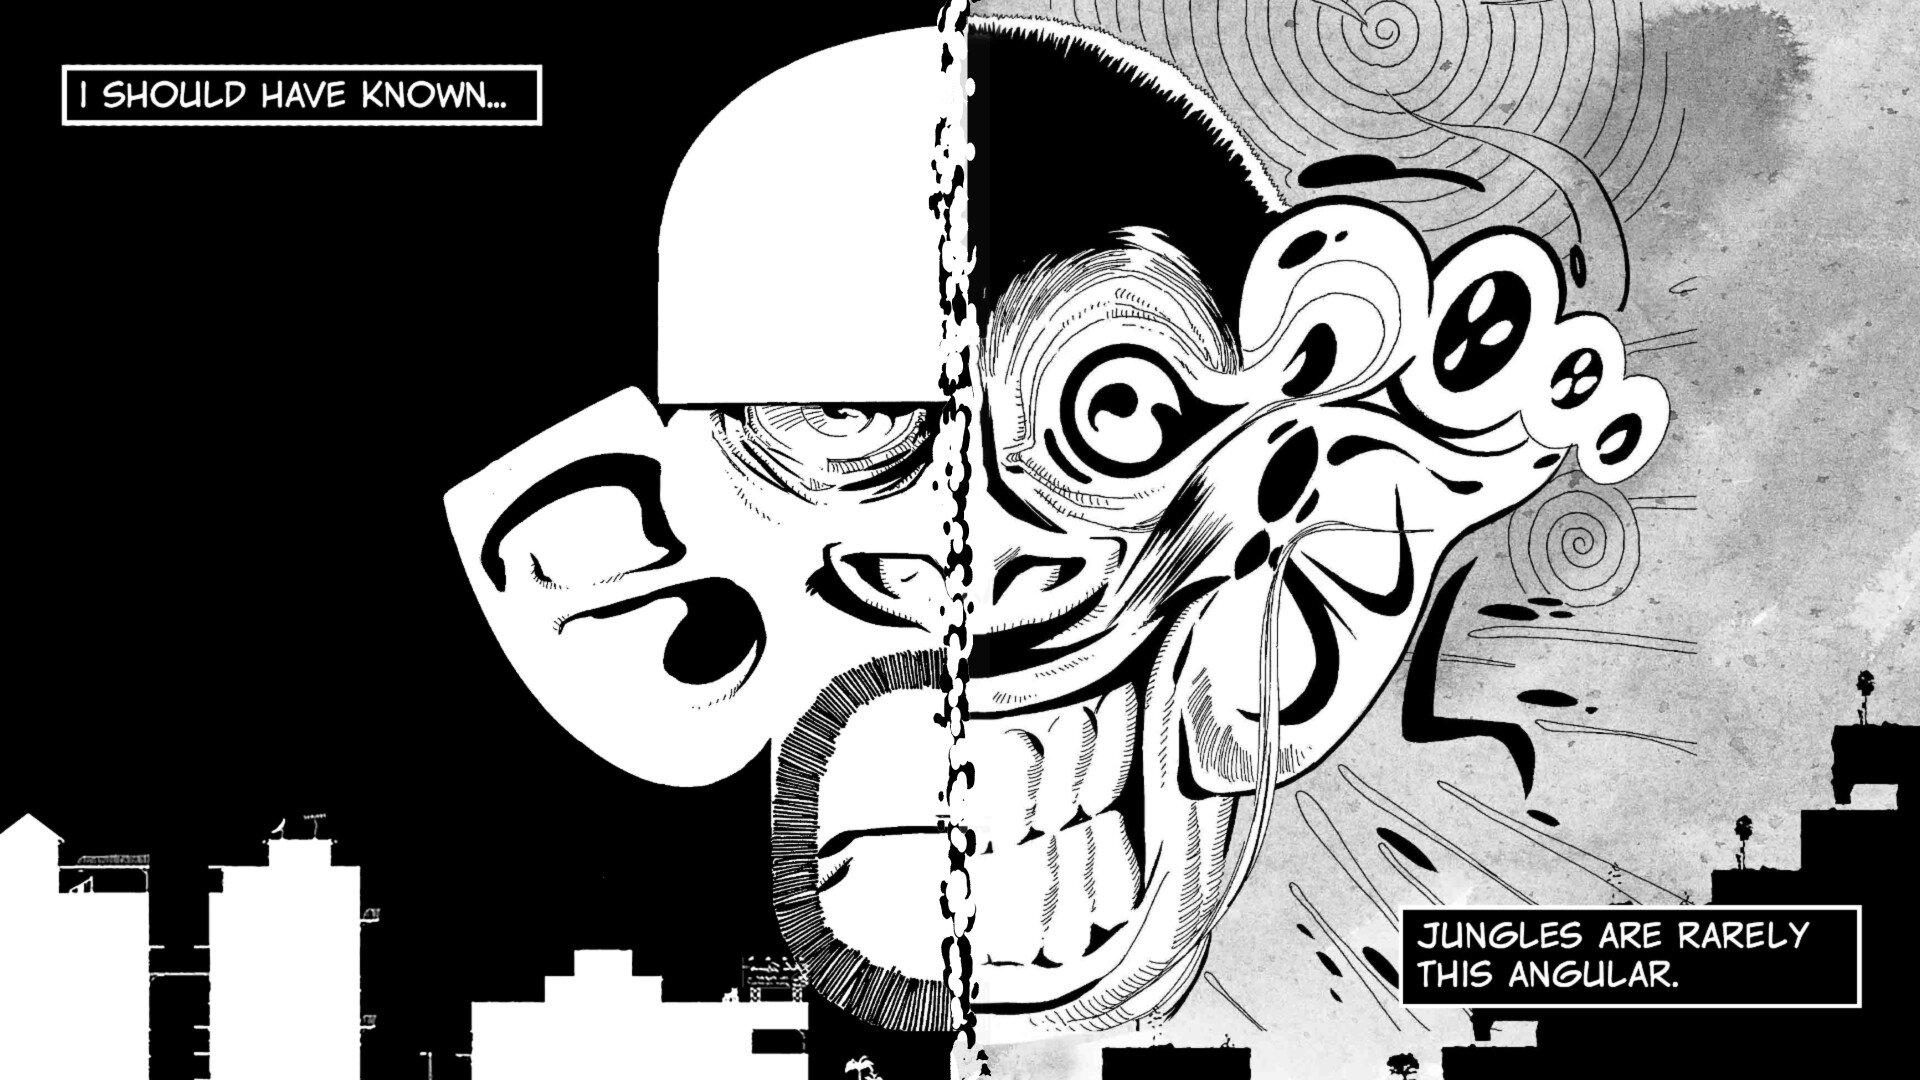 Liquid Sunshine game screenshot, comics panel